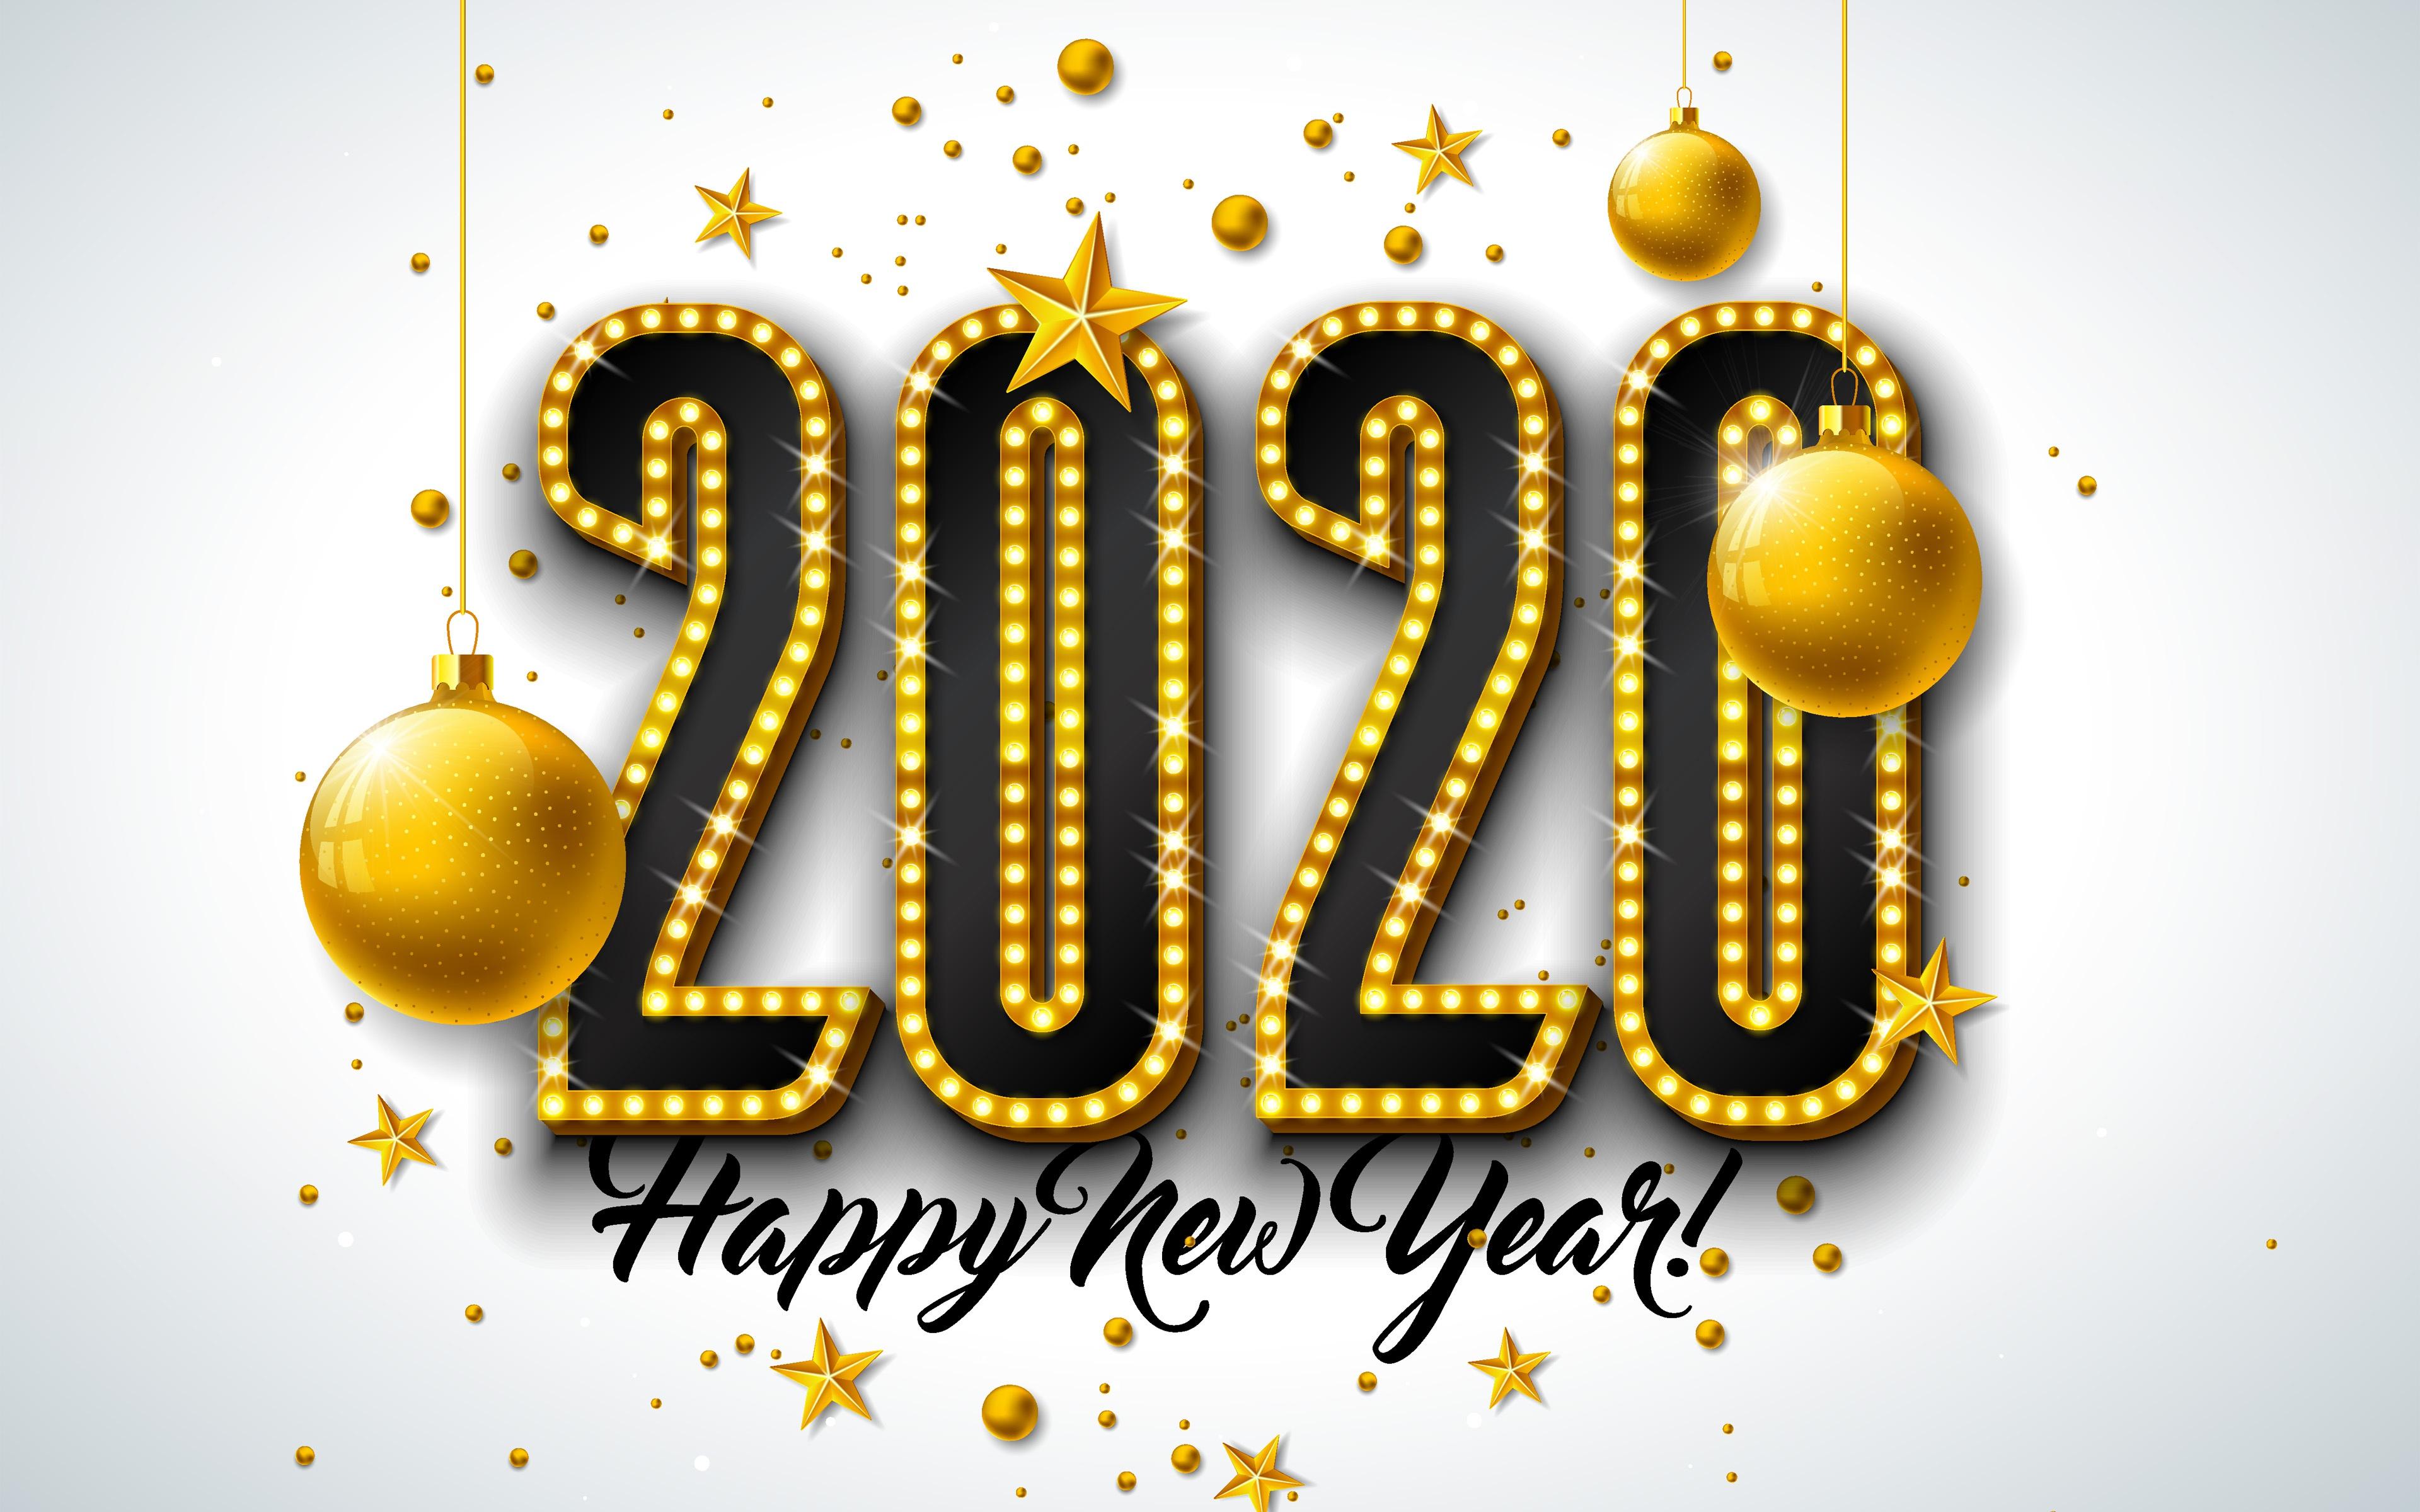 New Year 2020 4k Ultra HD Wallpaper Background Image 3840x2400 3840x2400